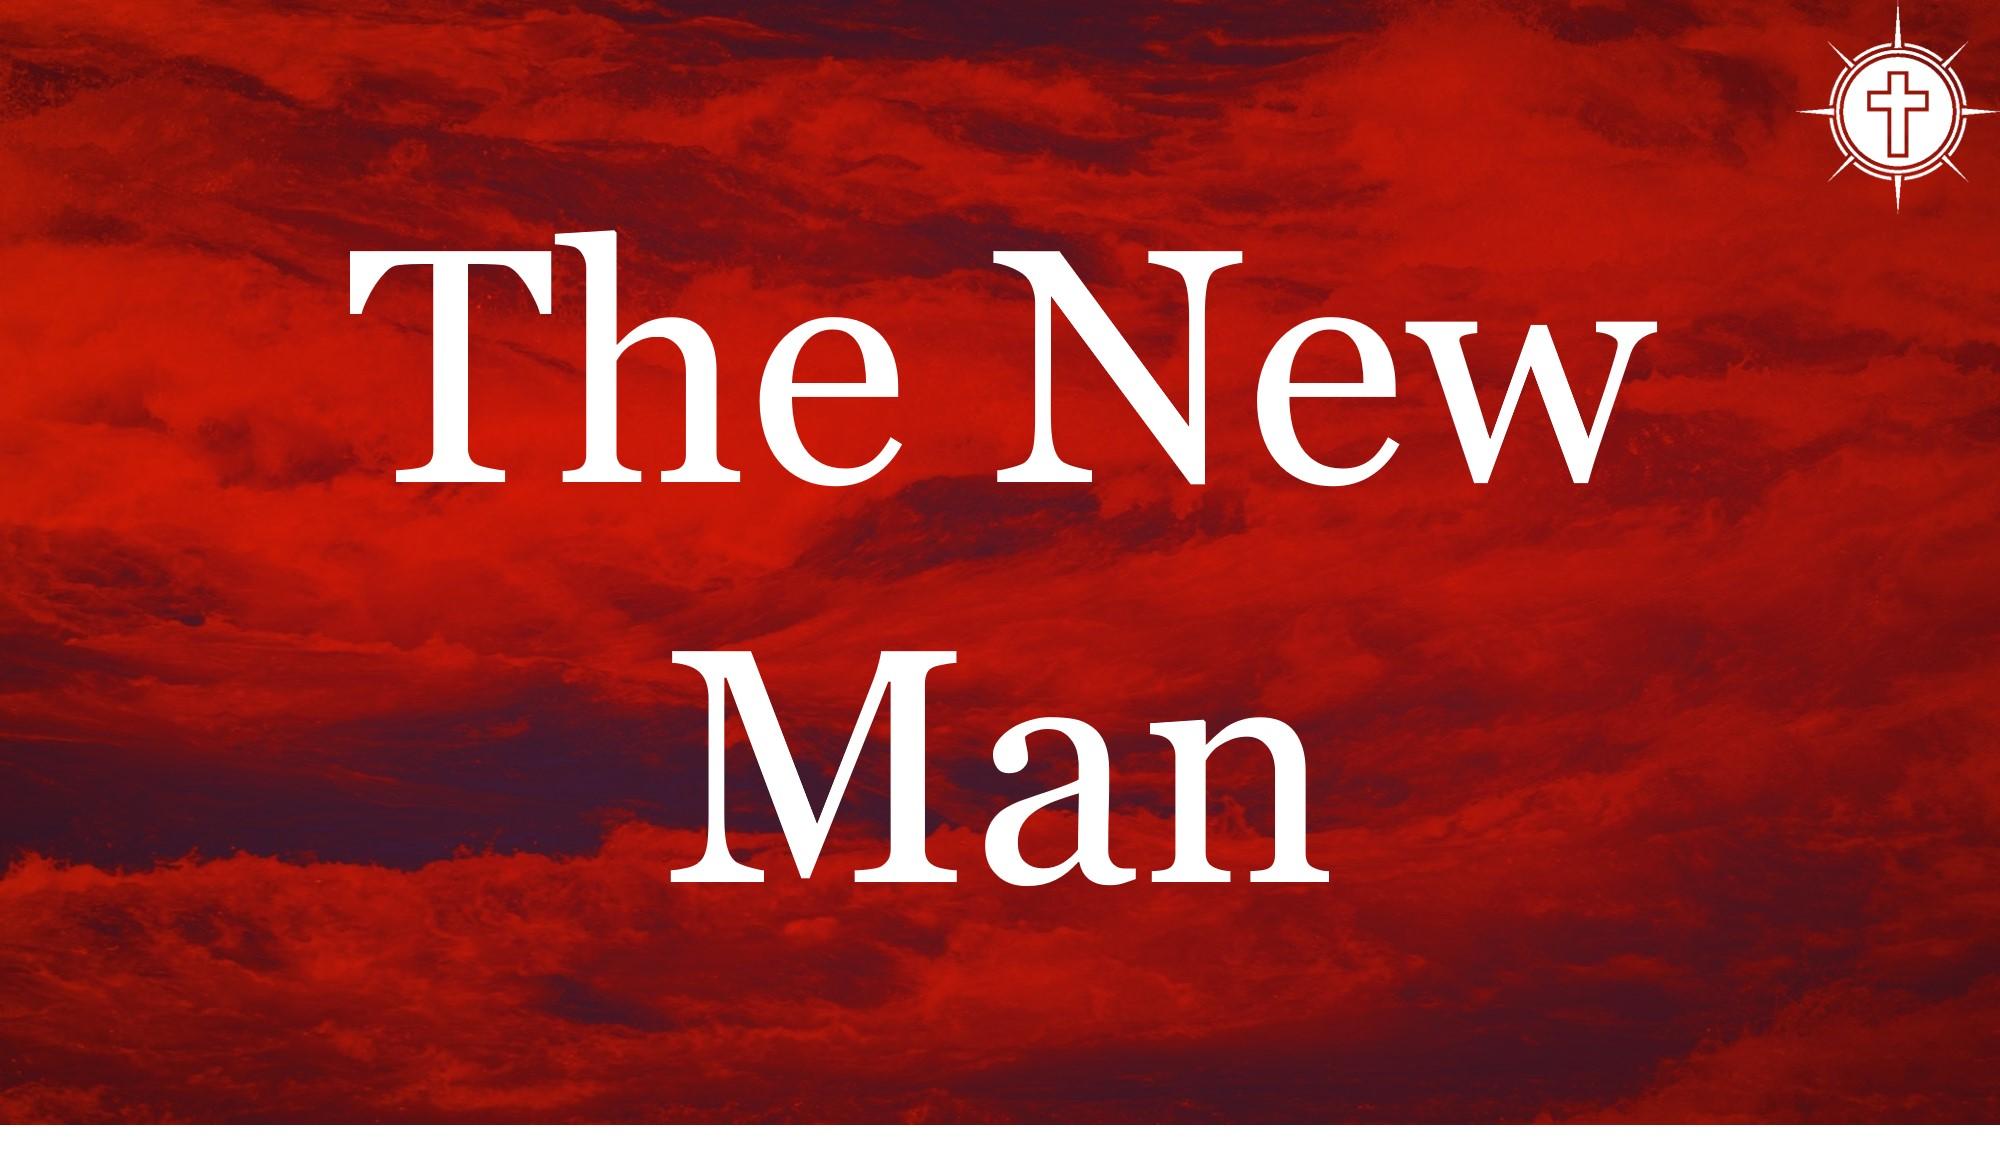 the new man.jpg